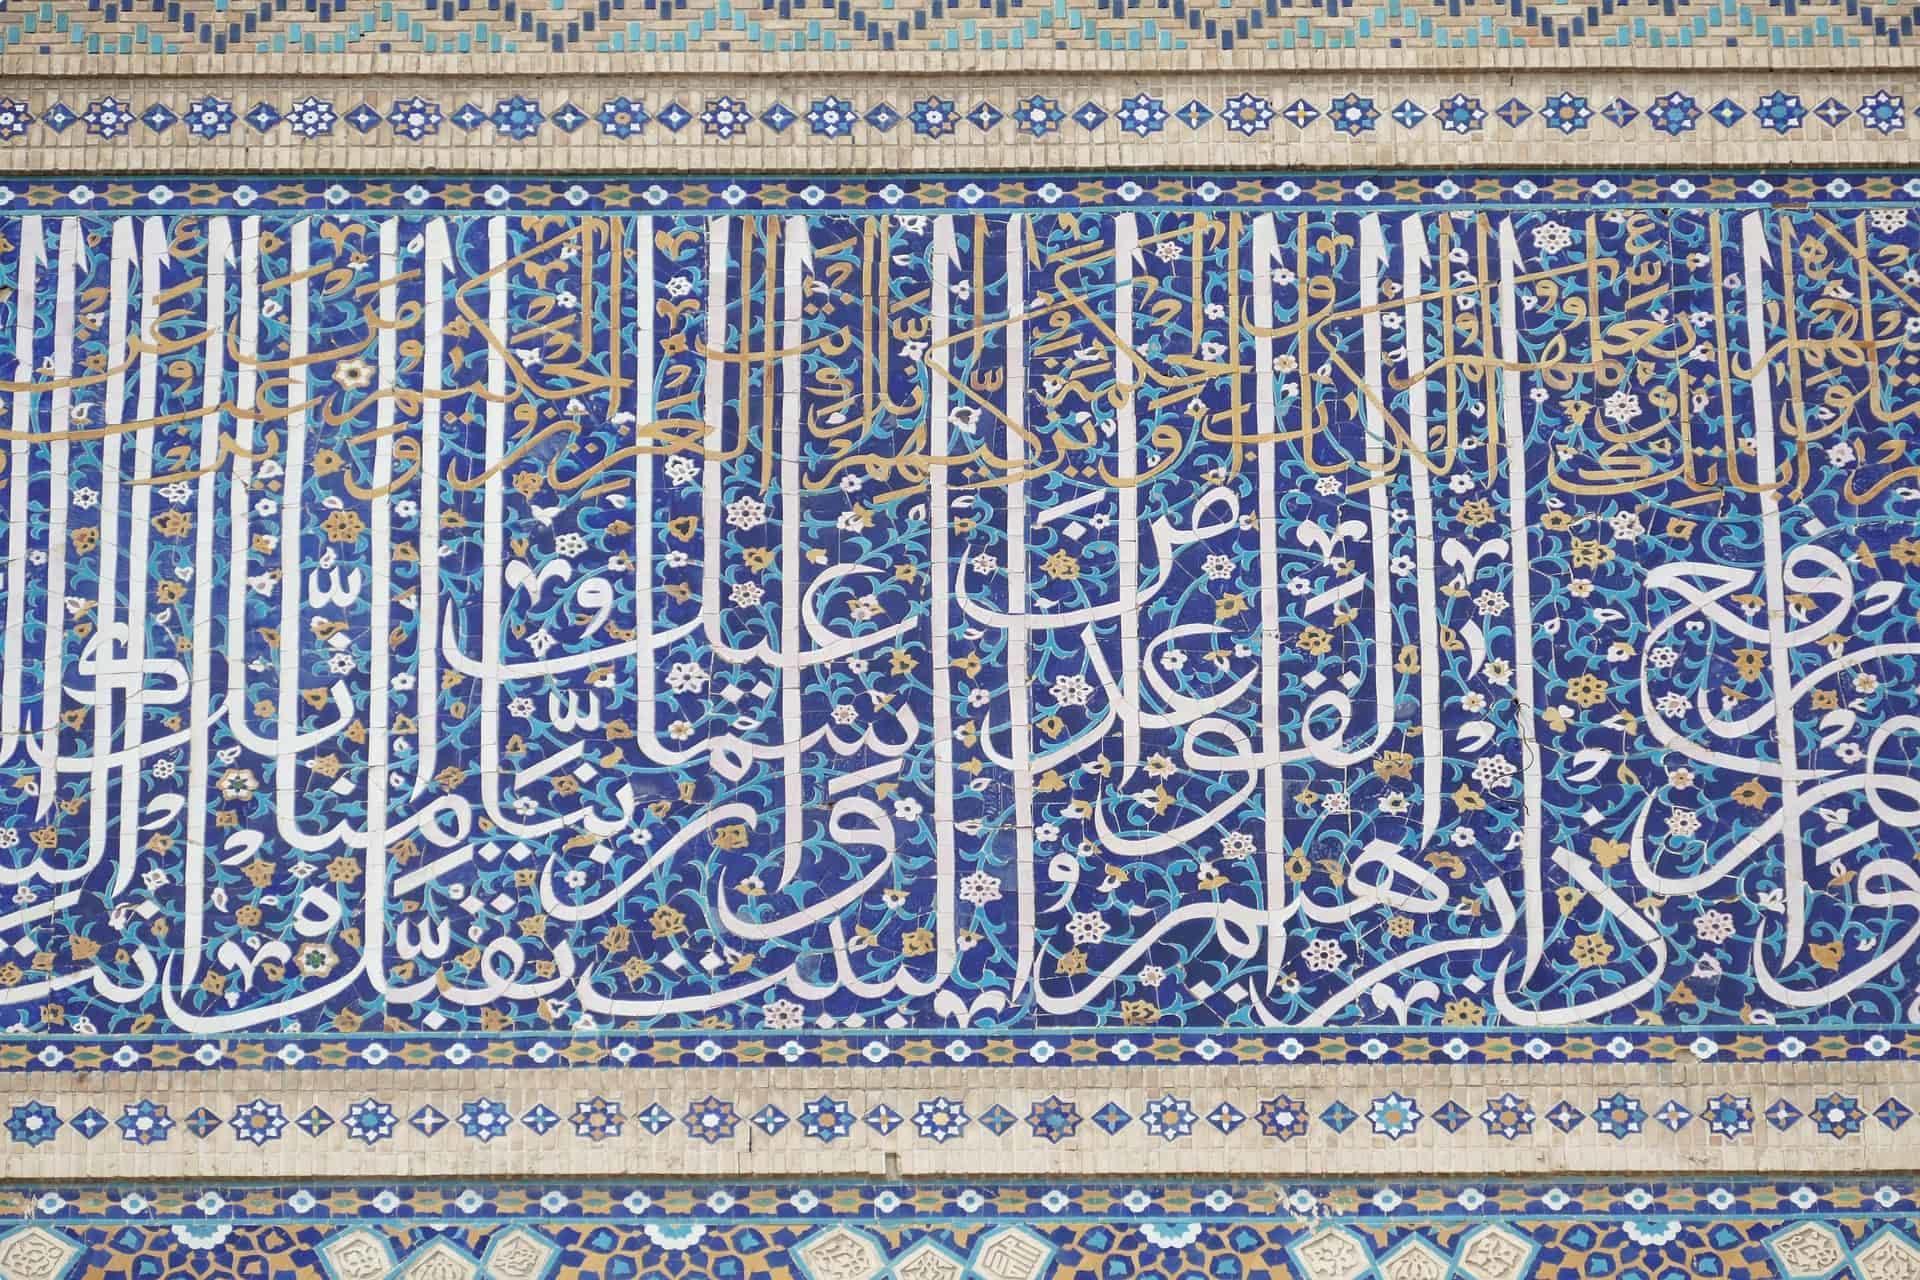 Detail Bibi Khanum Mosque Uzbekistan samarkand-4689080_1920